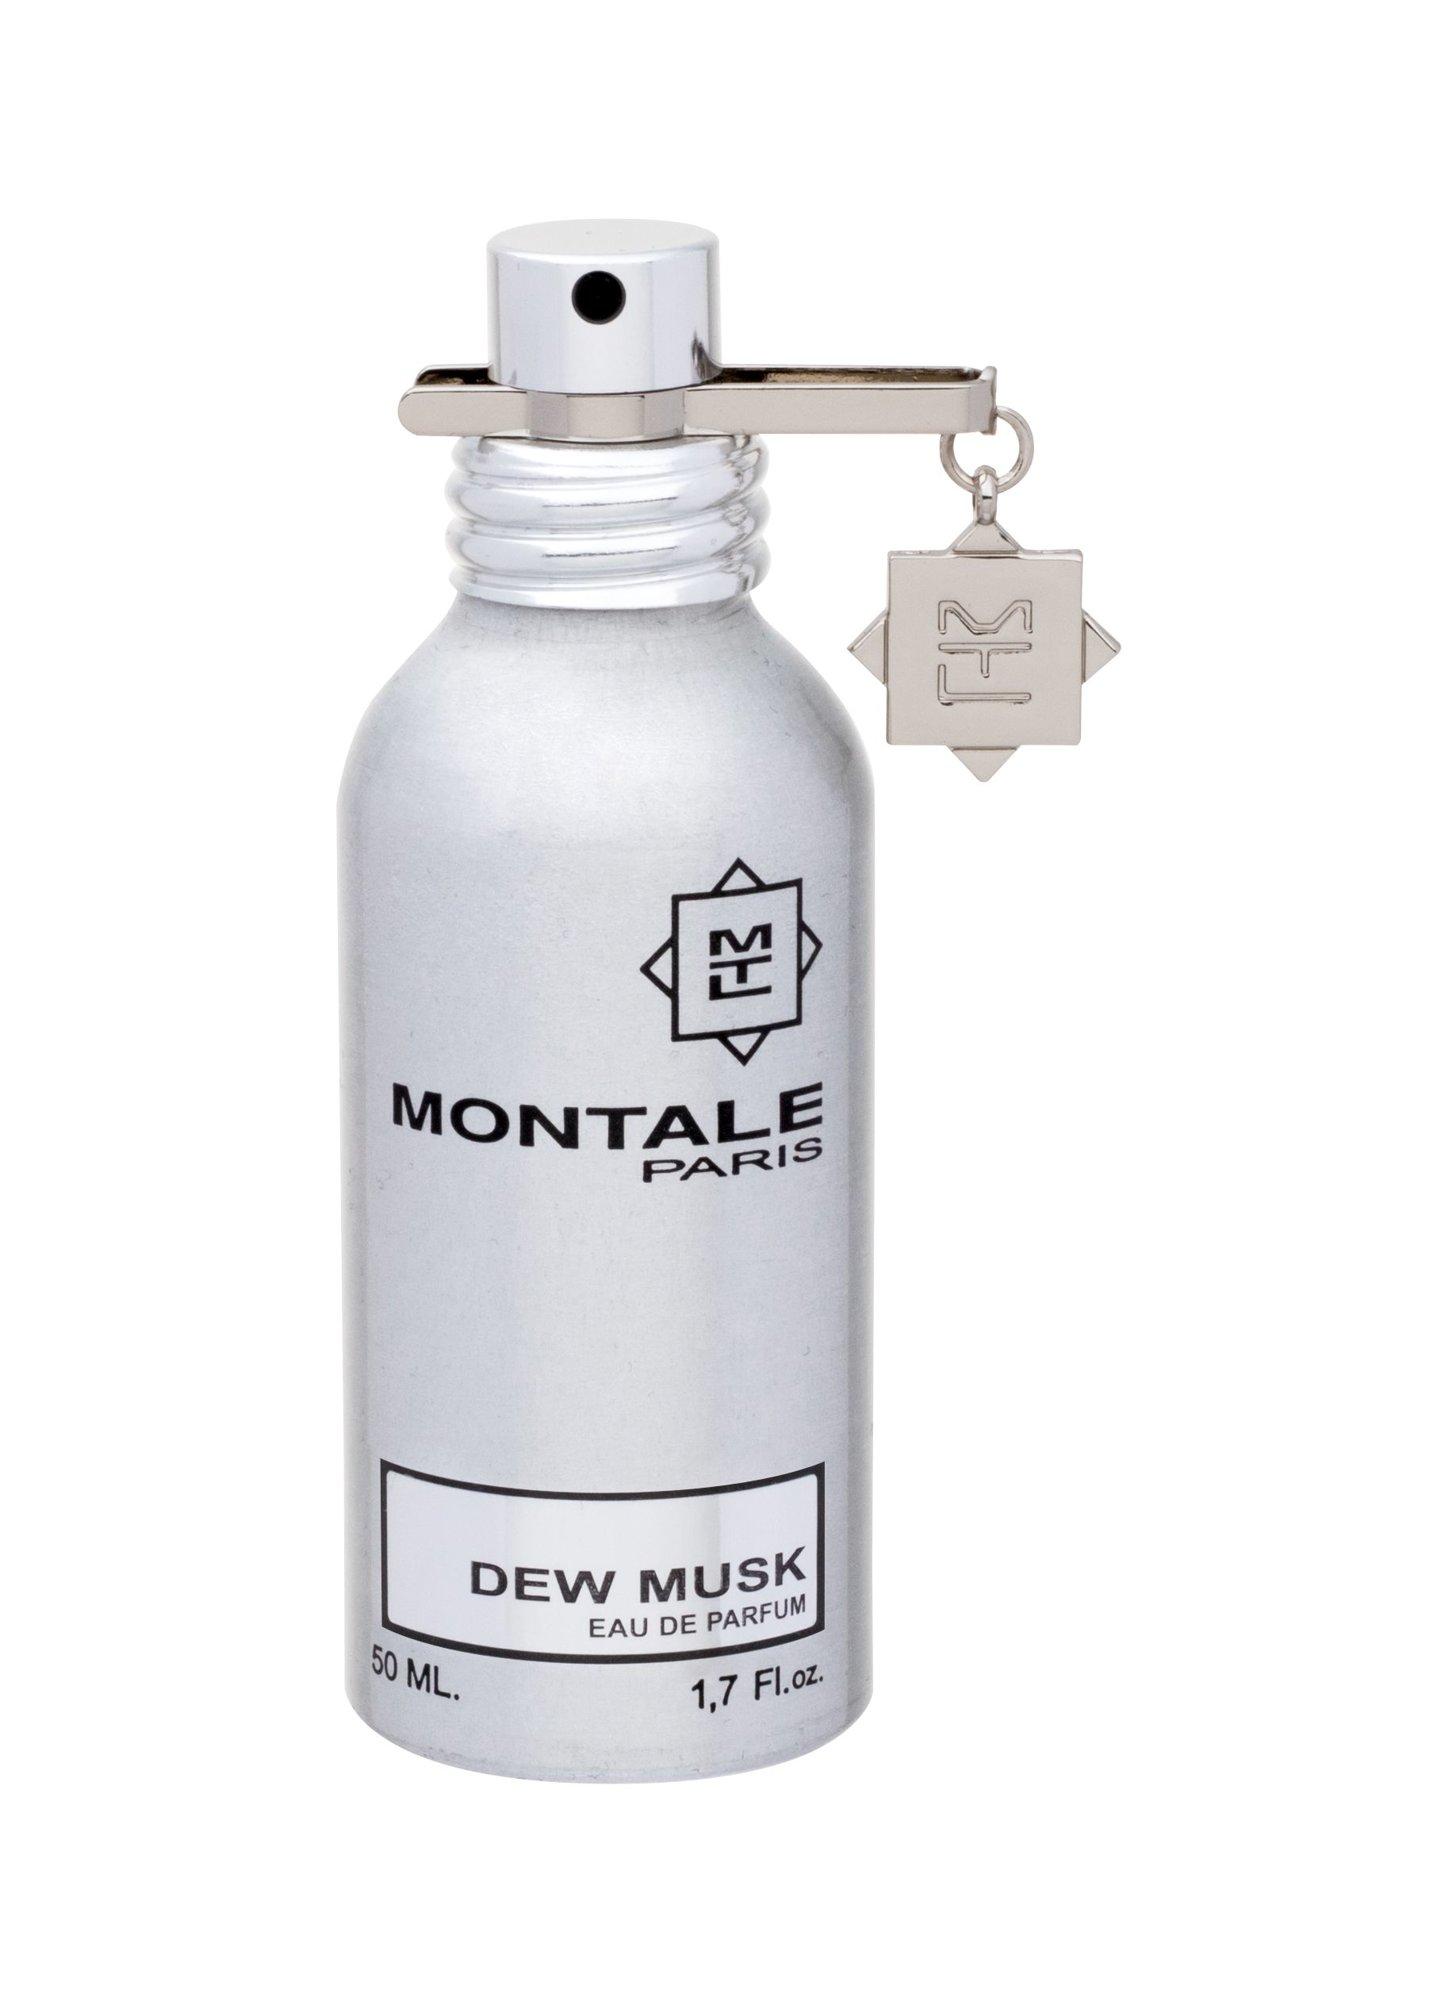 Montale Paris Dew musk EDP 50ml